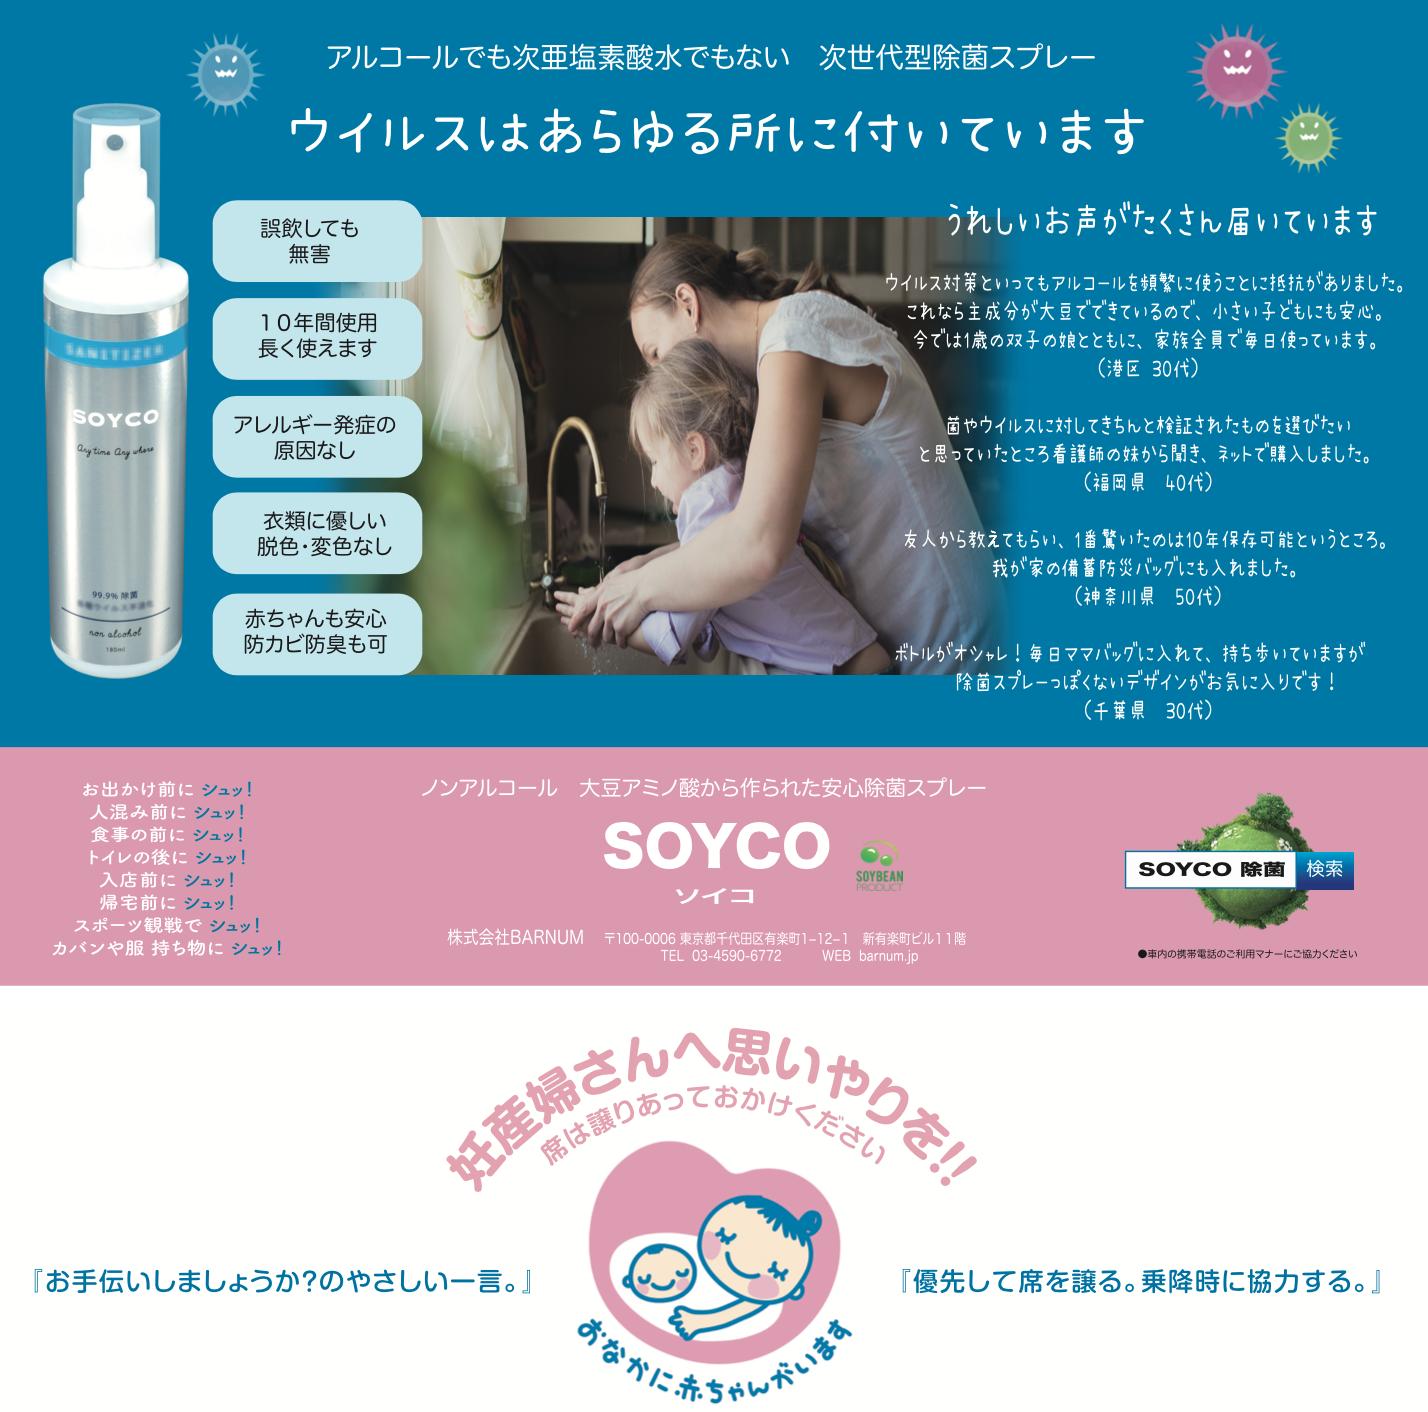 SOYCOがマタニティマークとタイアップしました!!!